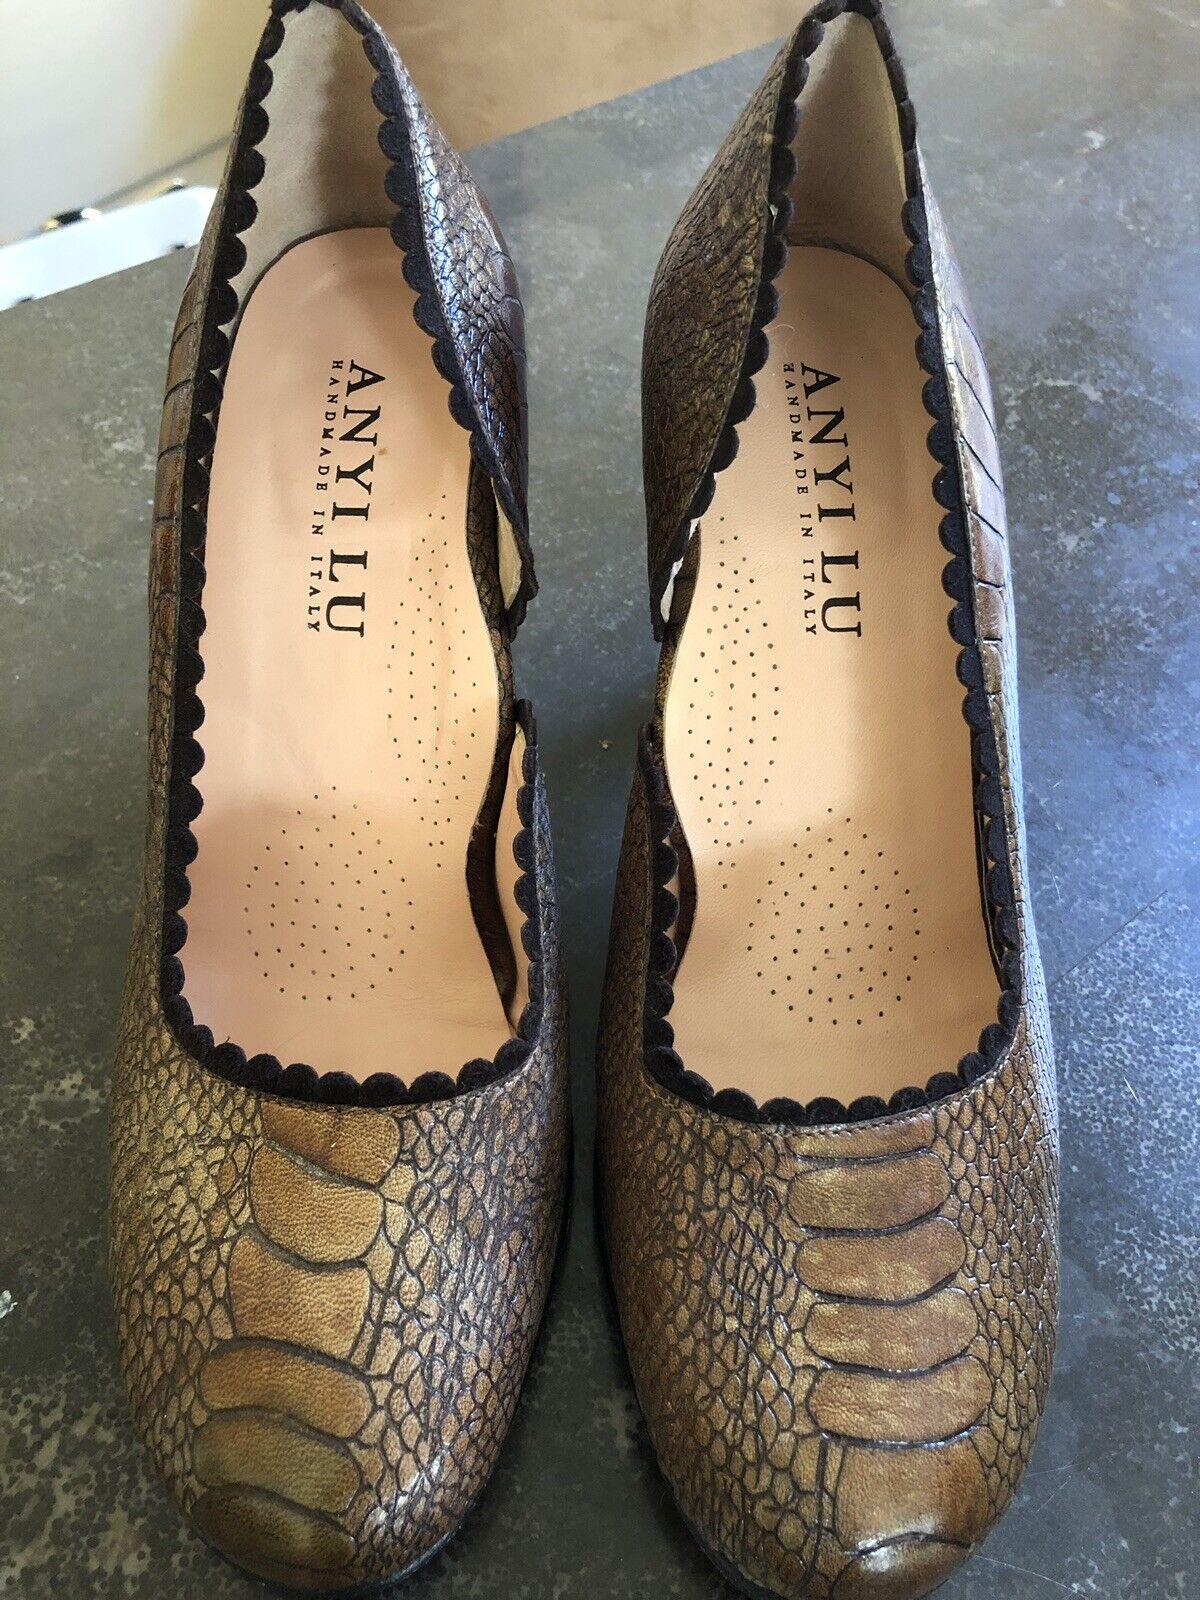 Anyi Lu Shoes 37.5 New Handmade Italy